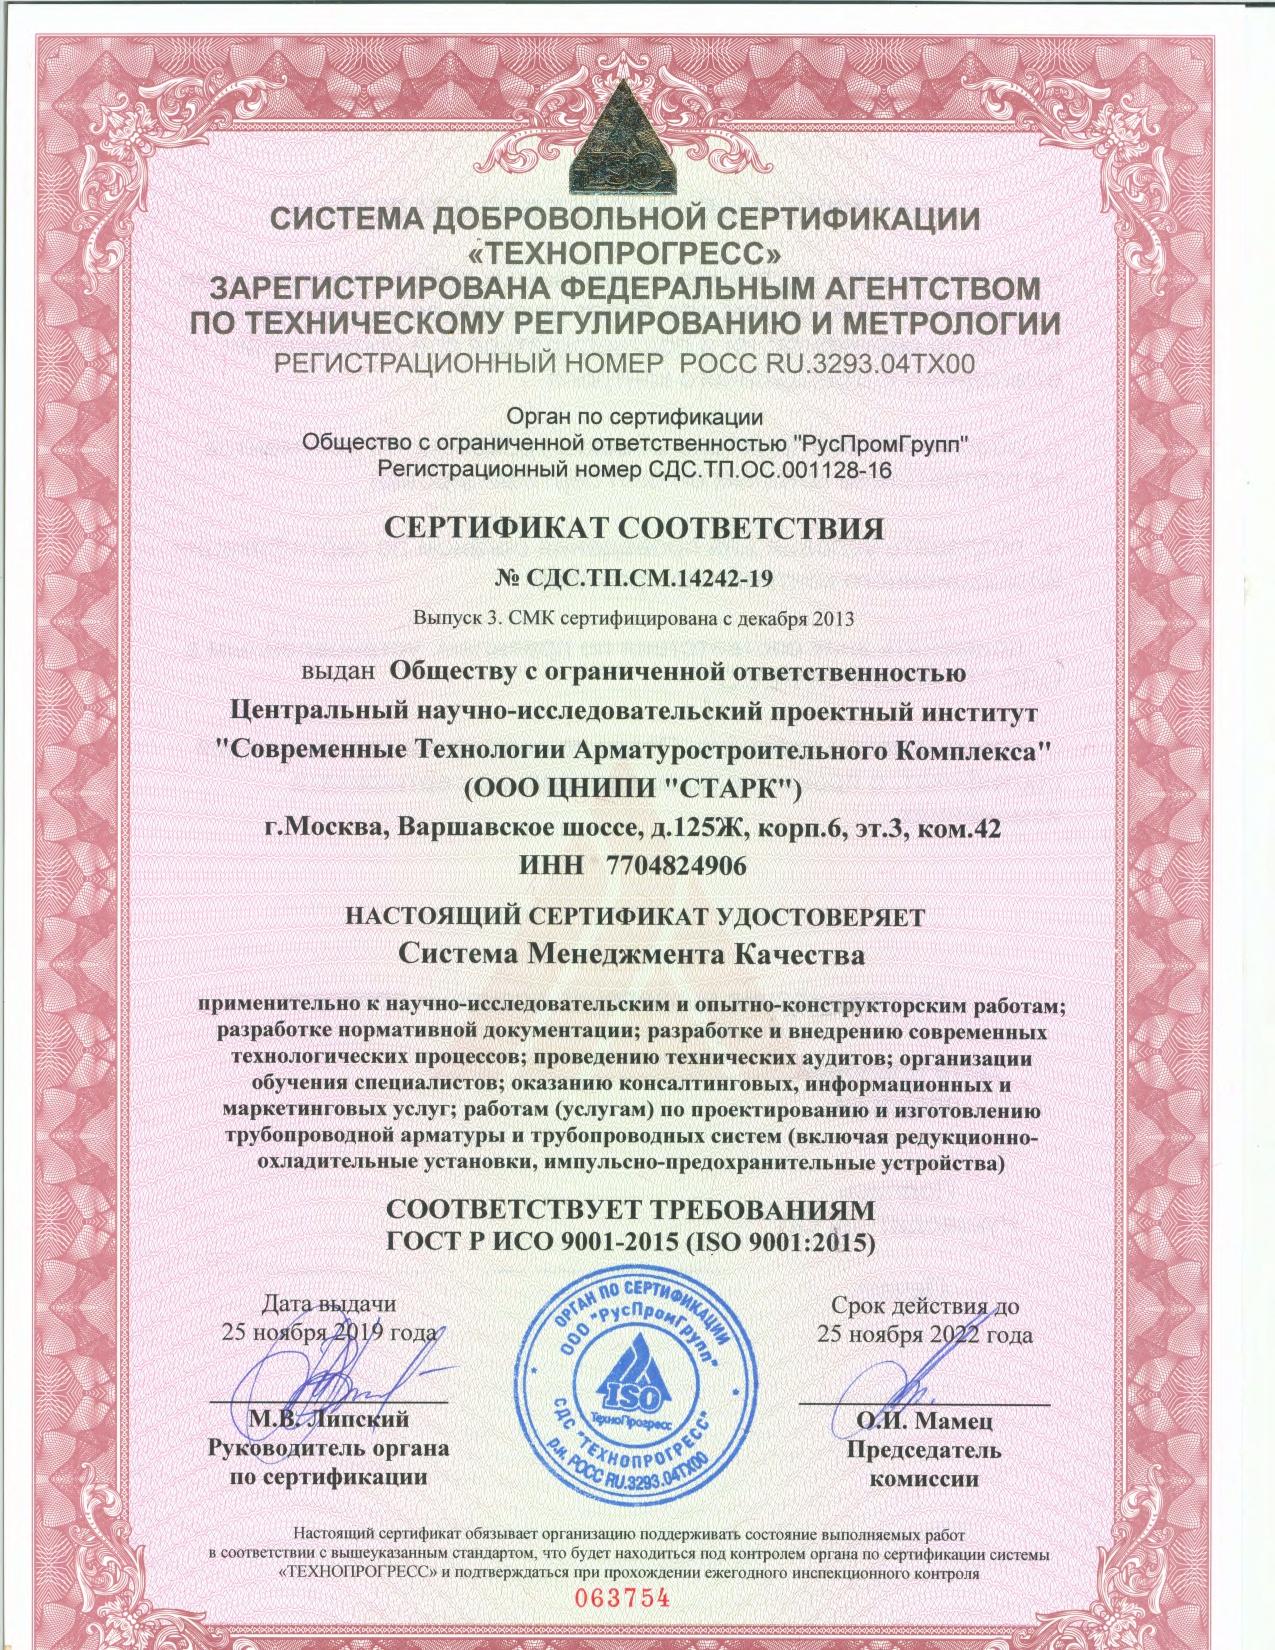 Сертификат СМК (ISO 9001-2015) 2019-2022 русский